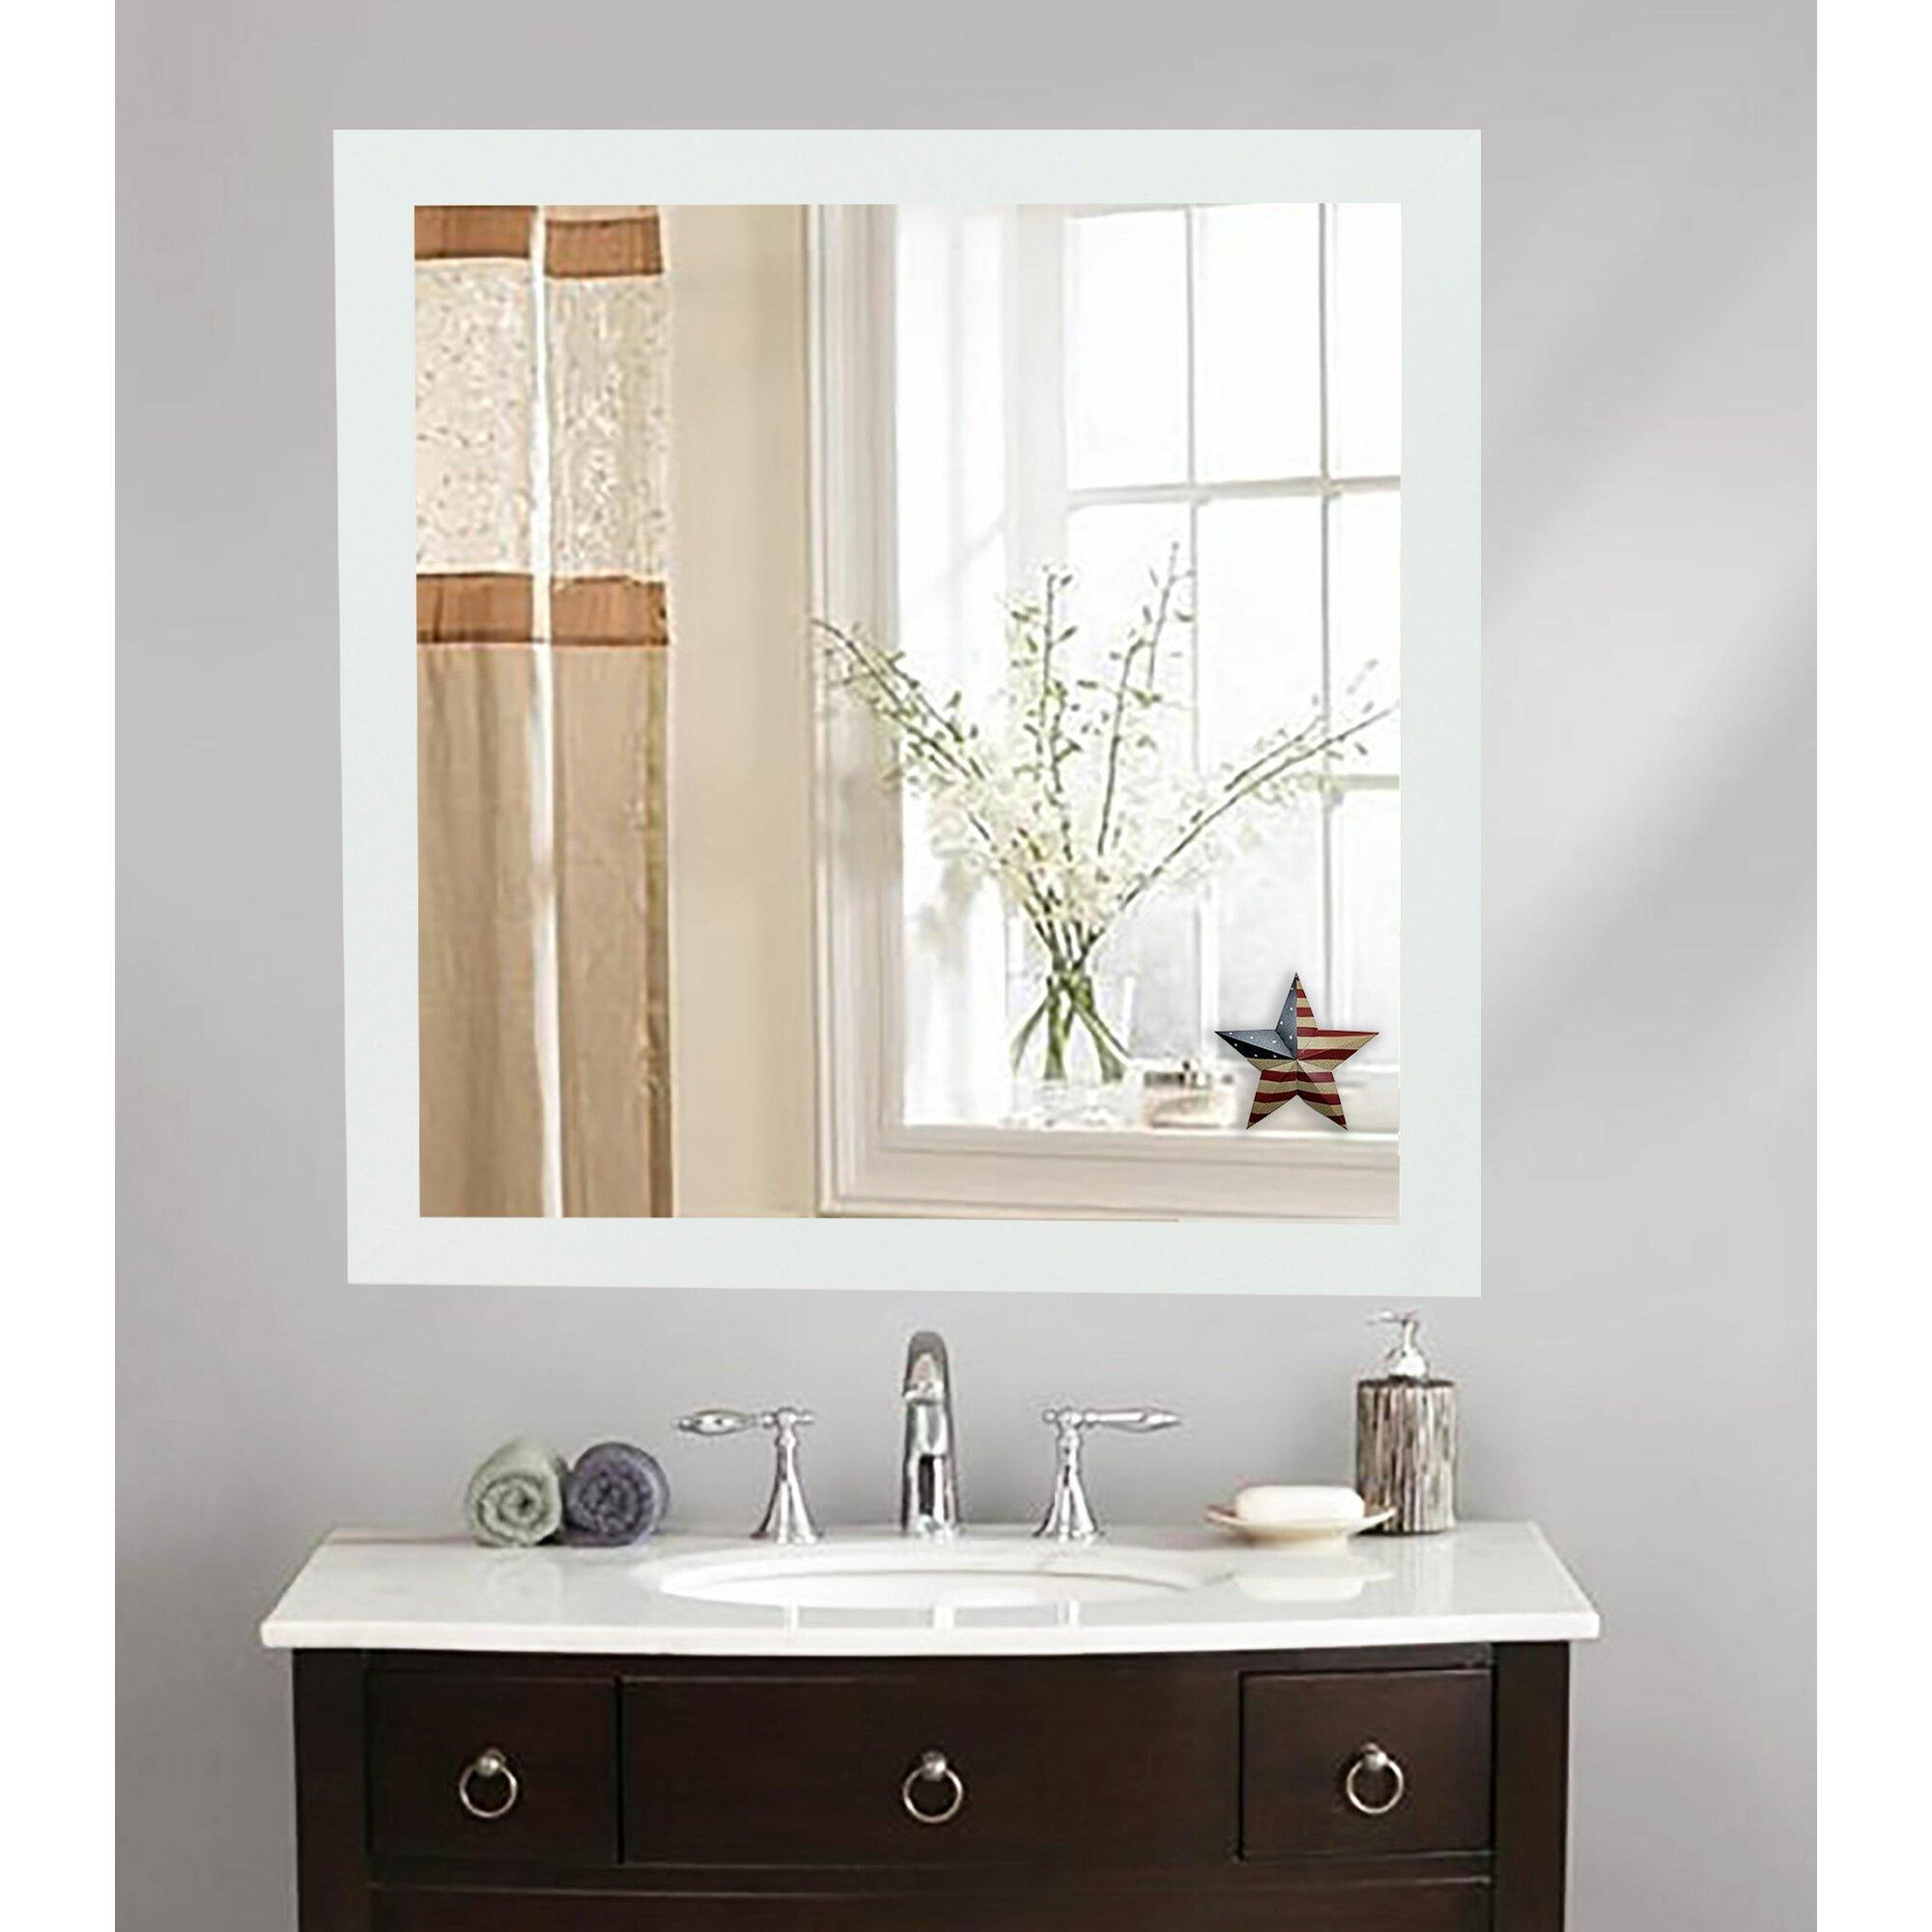 Brayden Studio Classic White Vanity Wall Mirror & Reviews